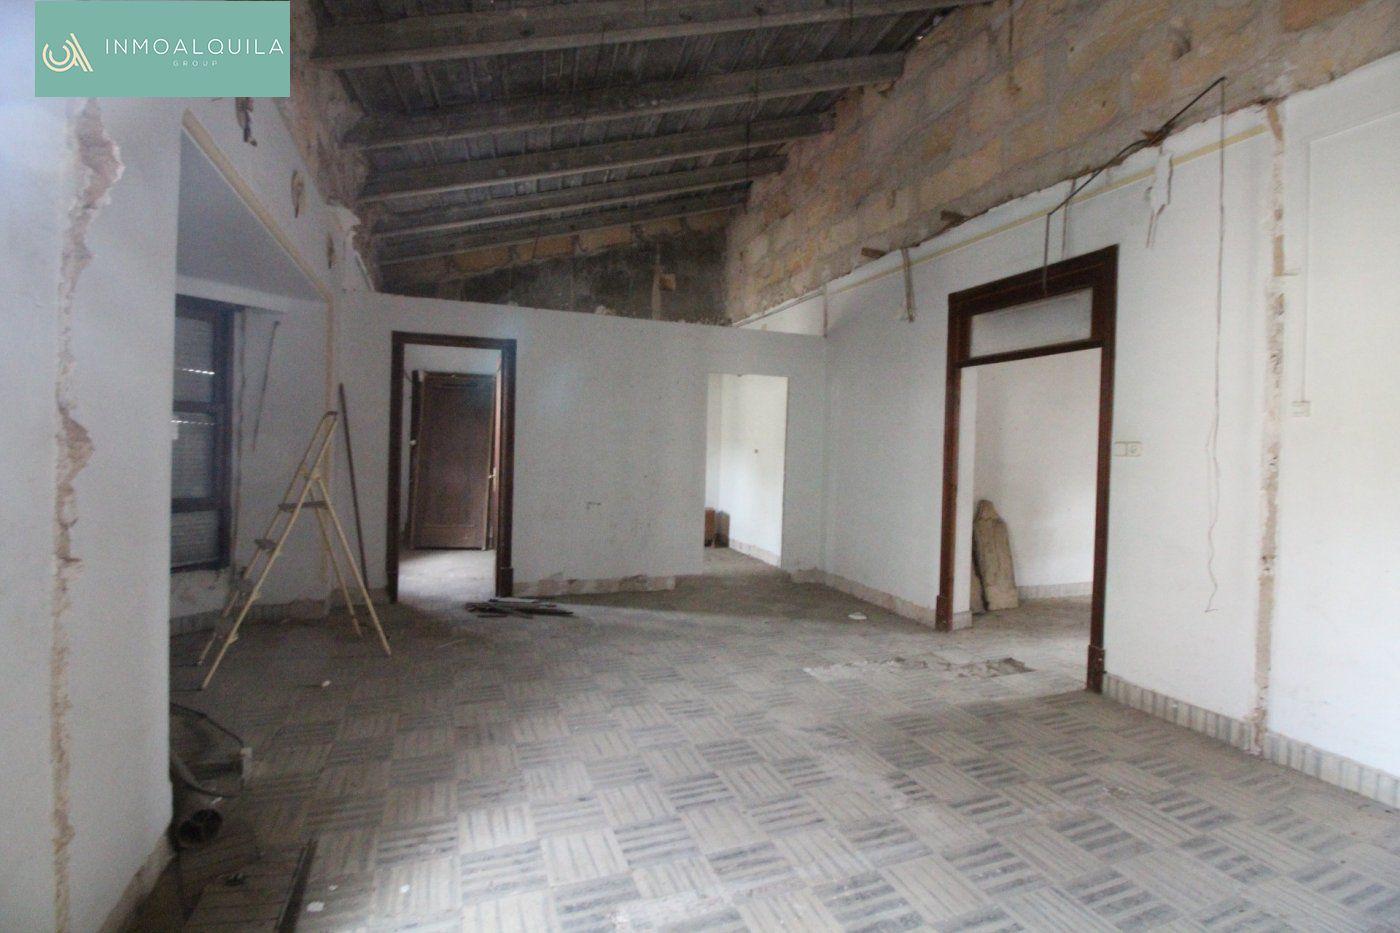 Appartamento  Lloseta ,lloseta. Primer piso techo libre en lloseta para reformar de 124 m2